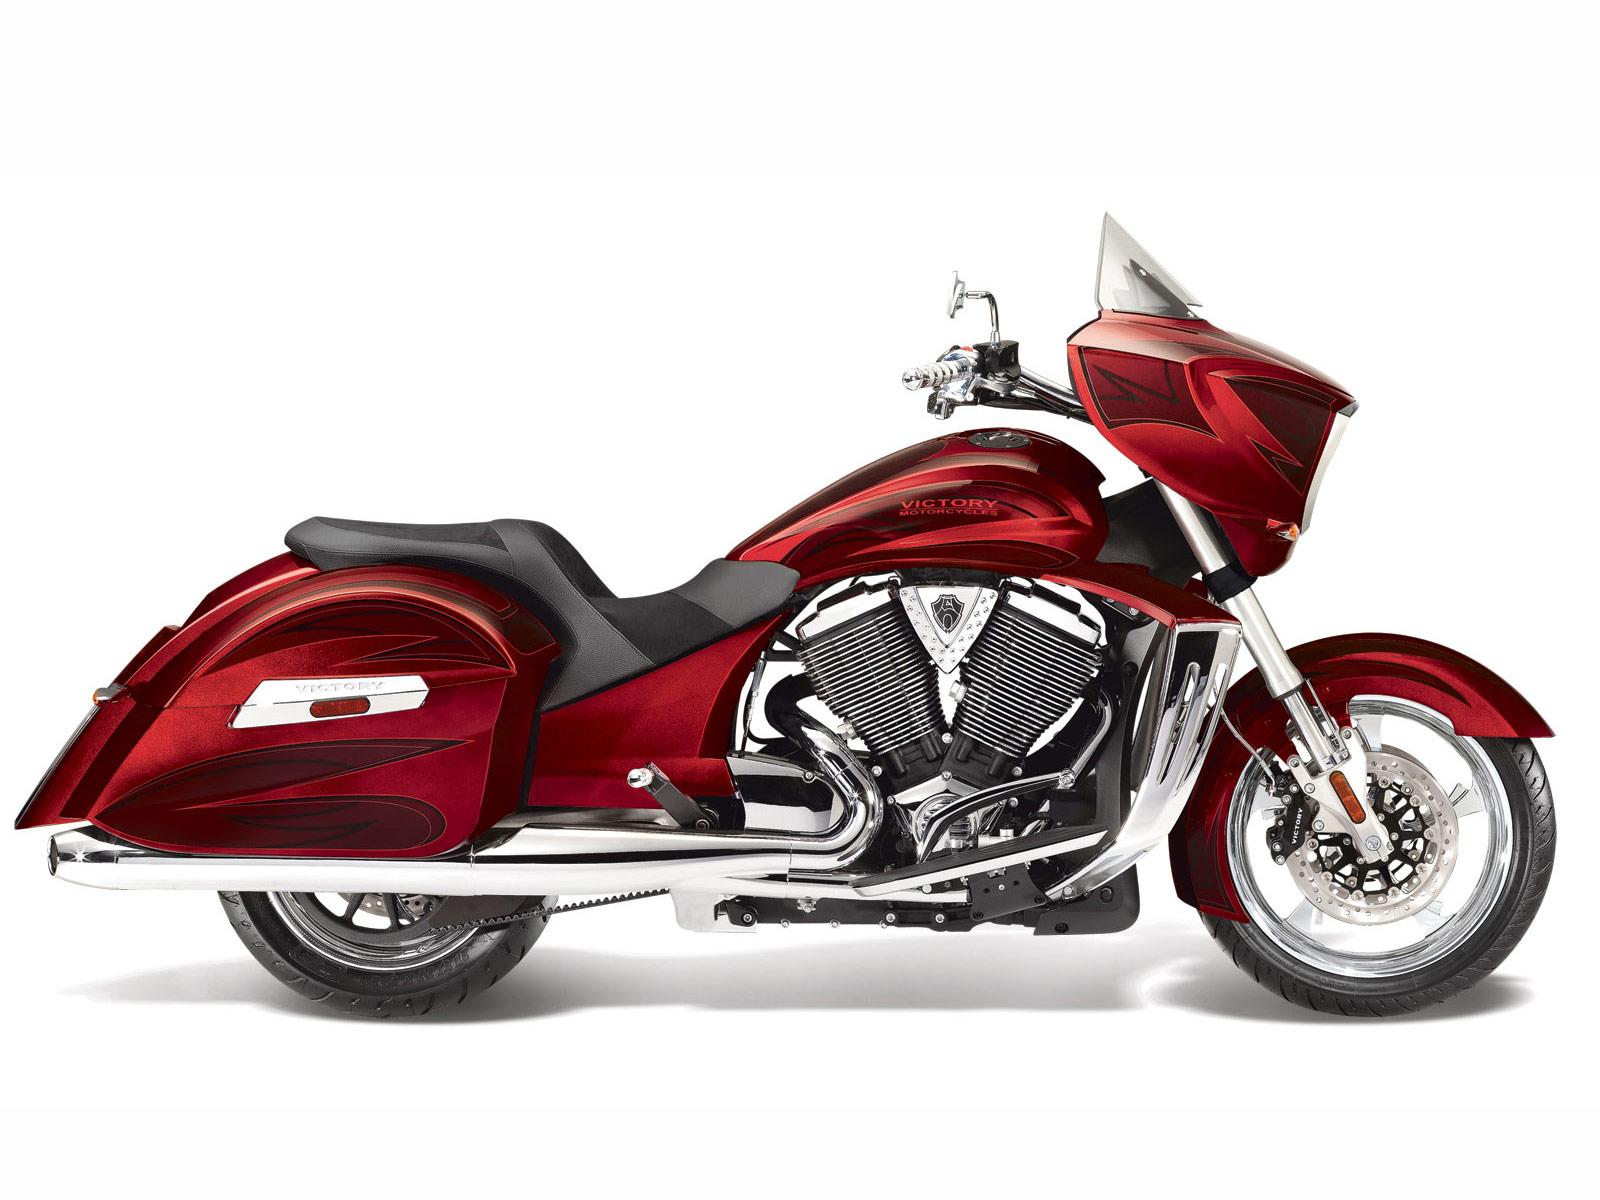 Gambar Motor VICTORY Cory Ness Country 2011 1600x1200